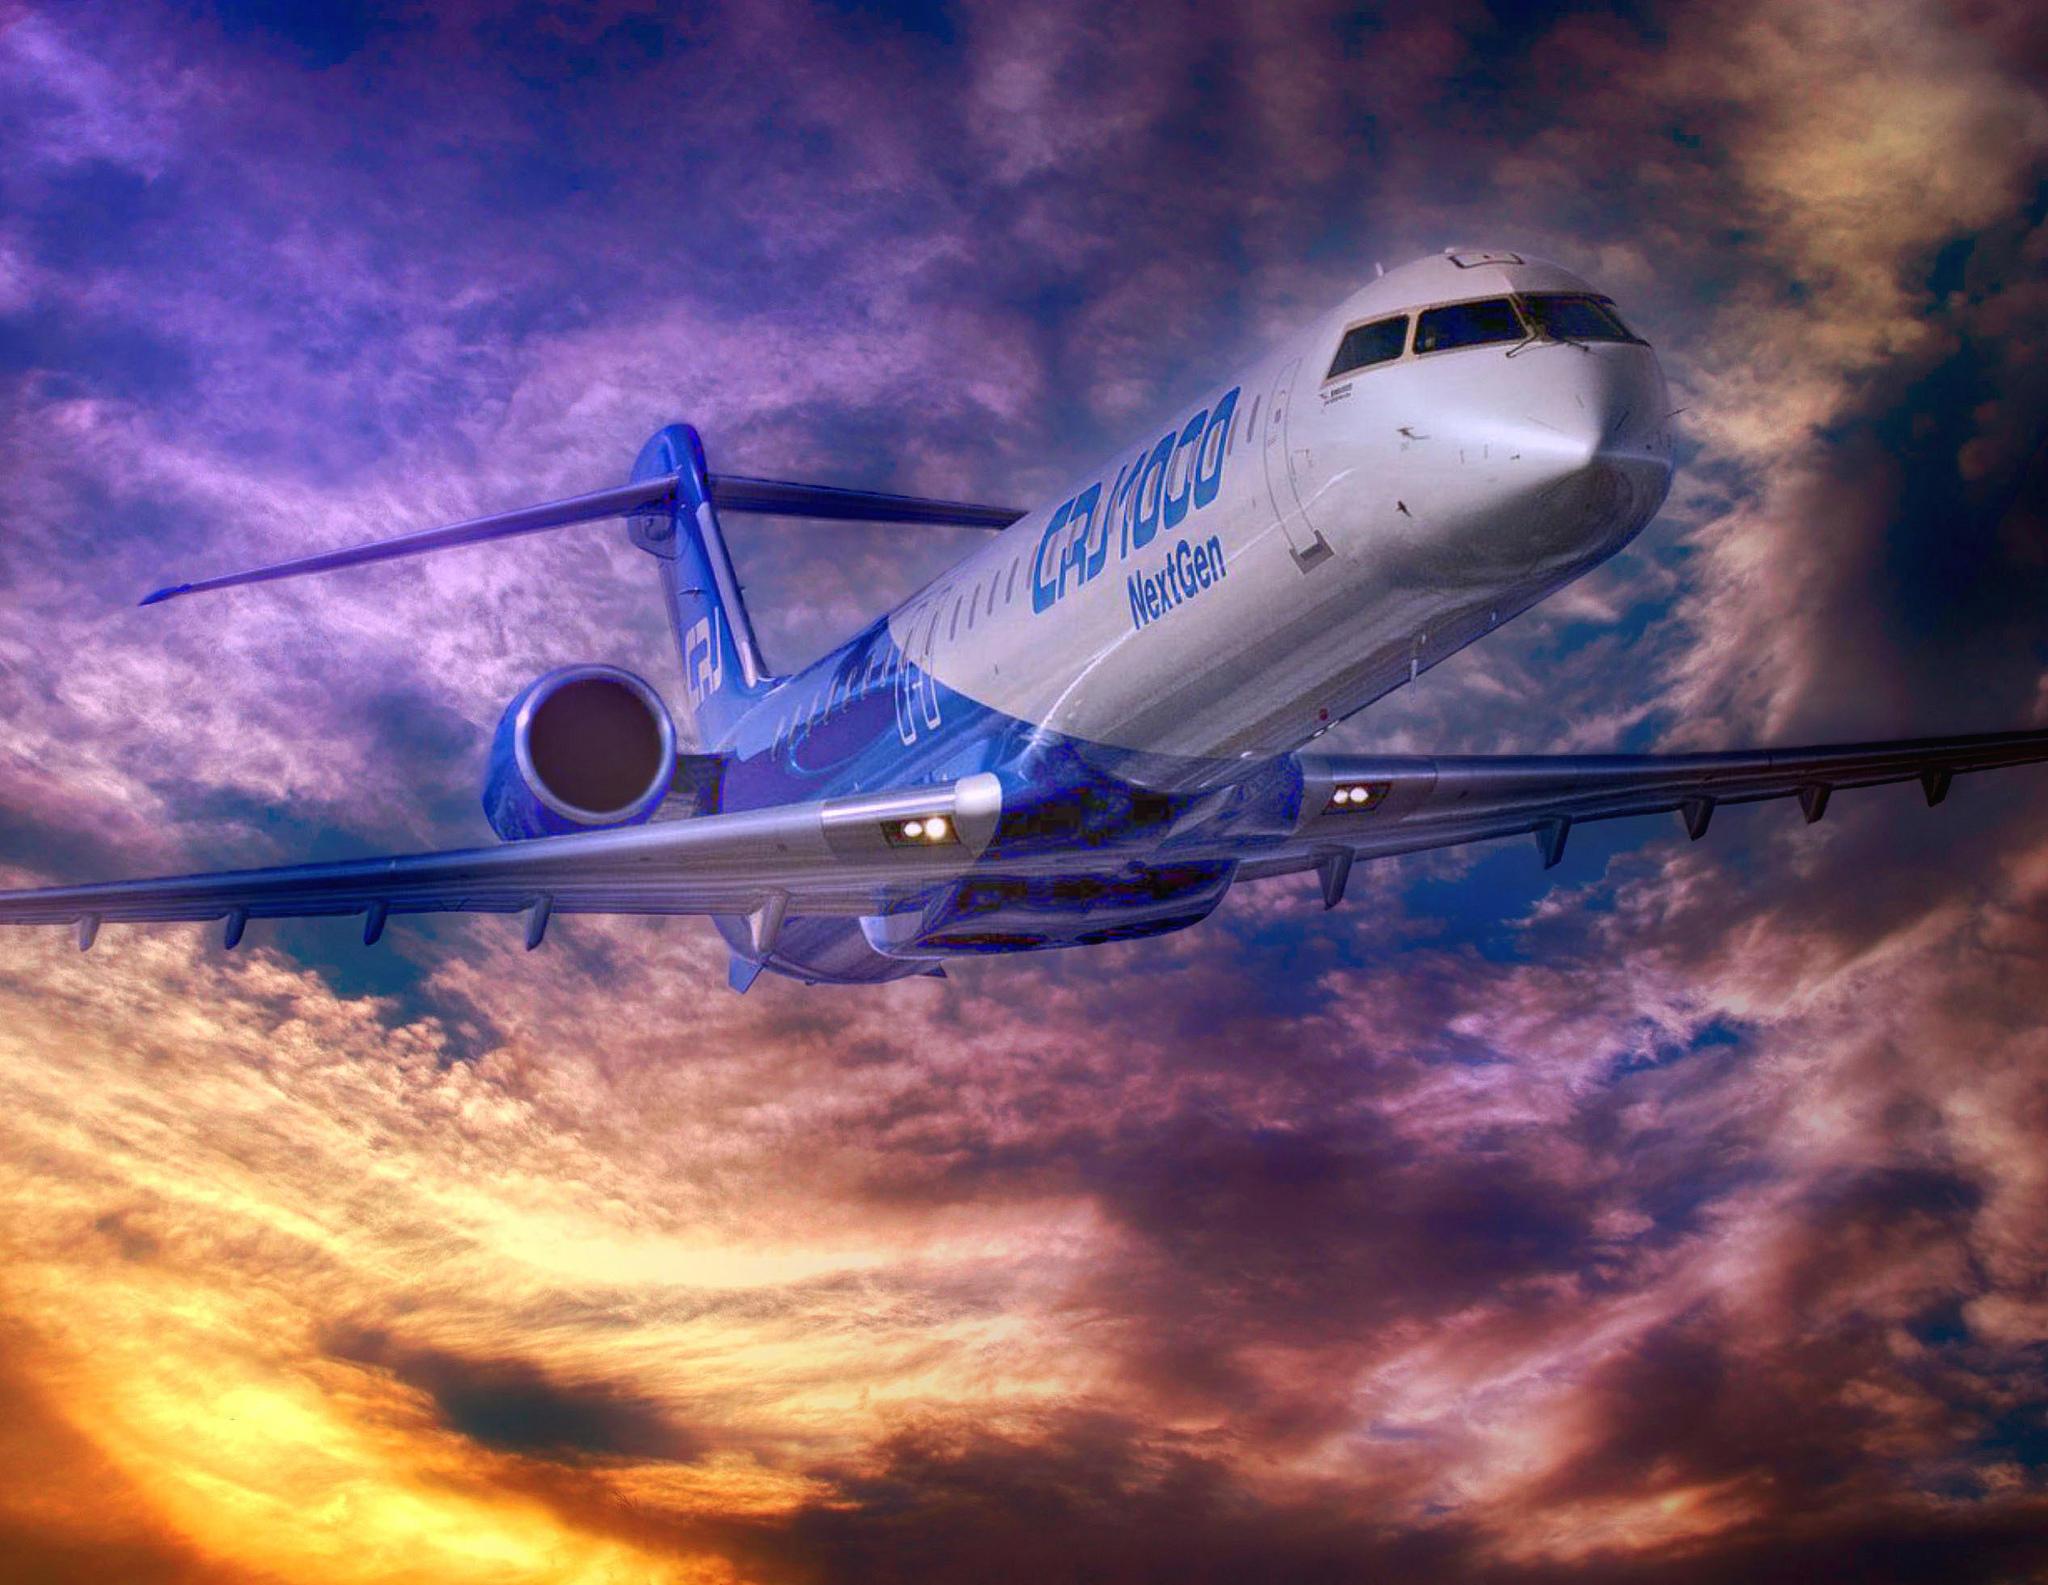 обои Bombardier CRJ-1000, пассажирский самолет, небо, закат картинки фото